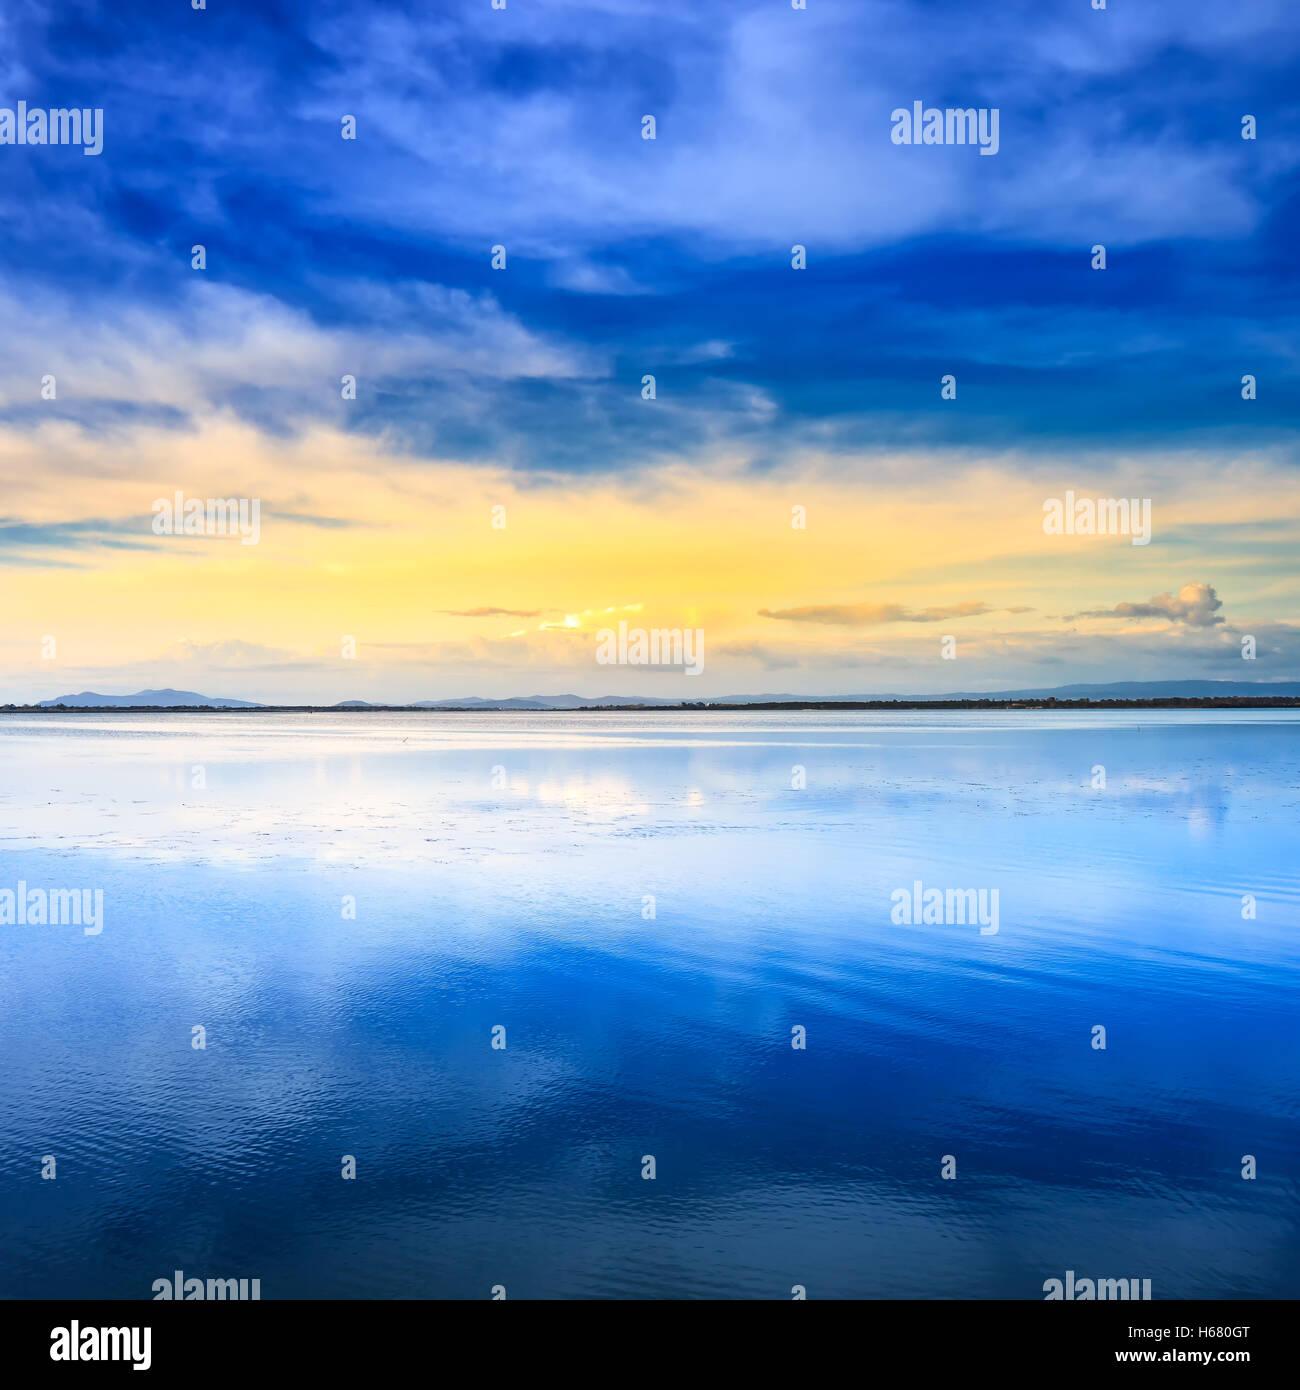 Sunset blue and yellow lagoon landscape. Orbetello lagoon, Monte Argentario, Tuscany, Italy. - Stock Image